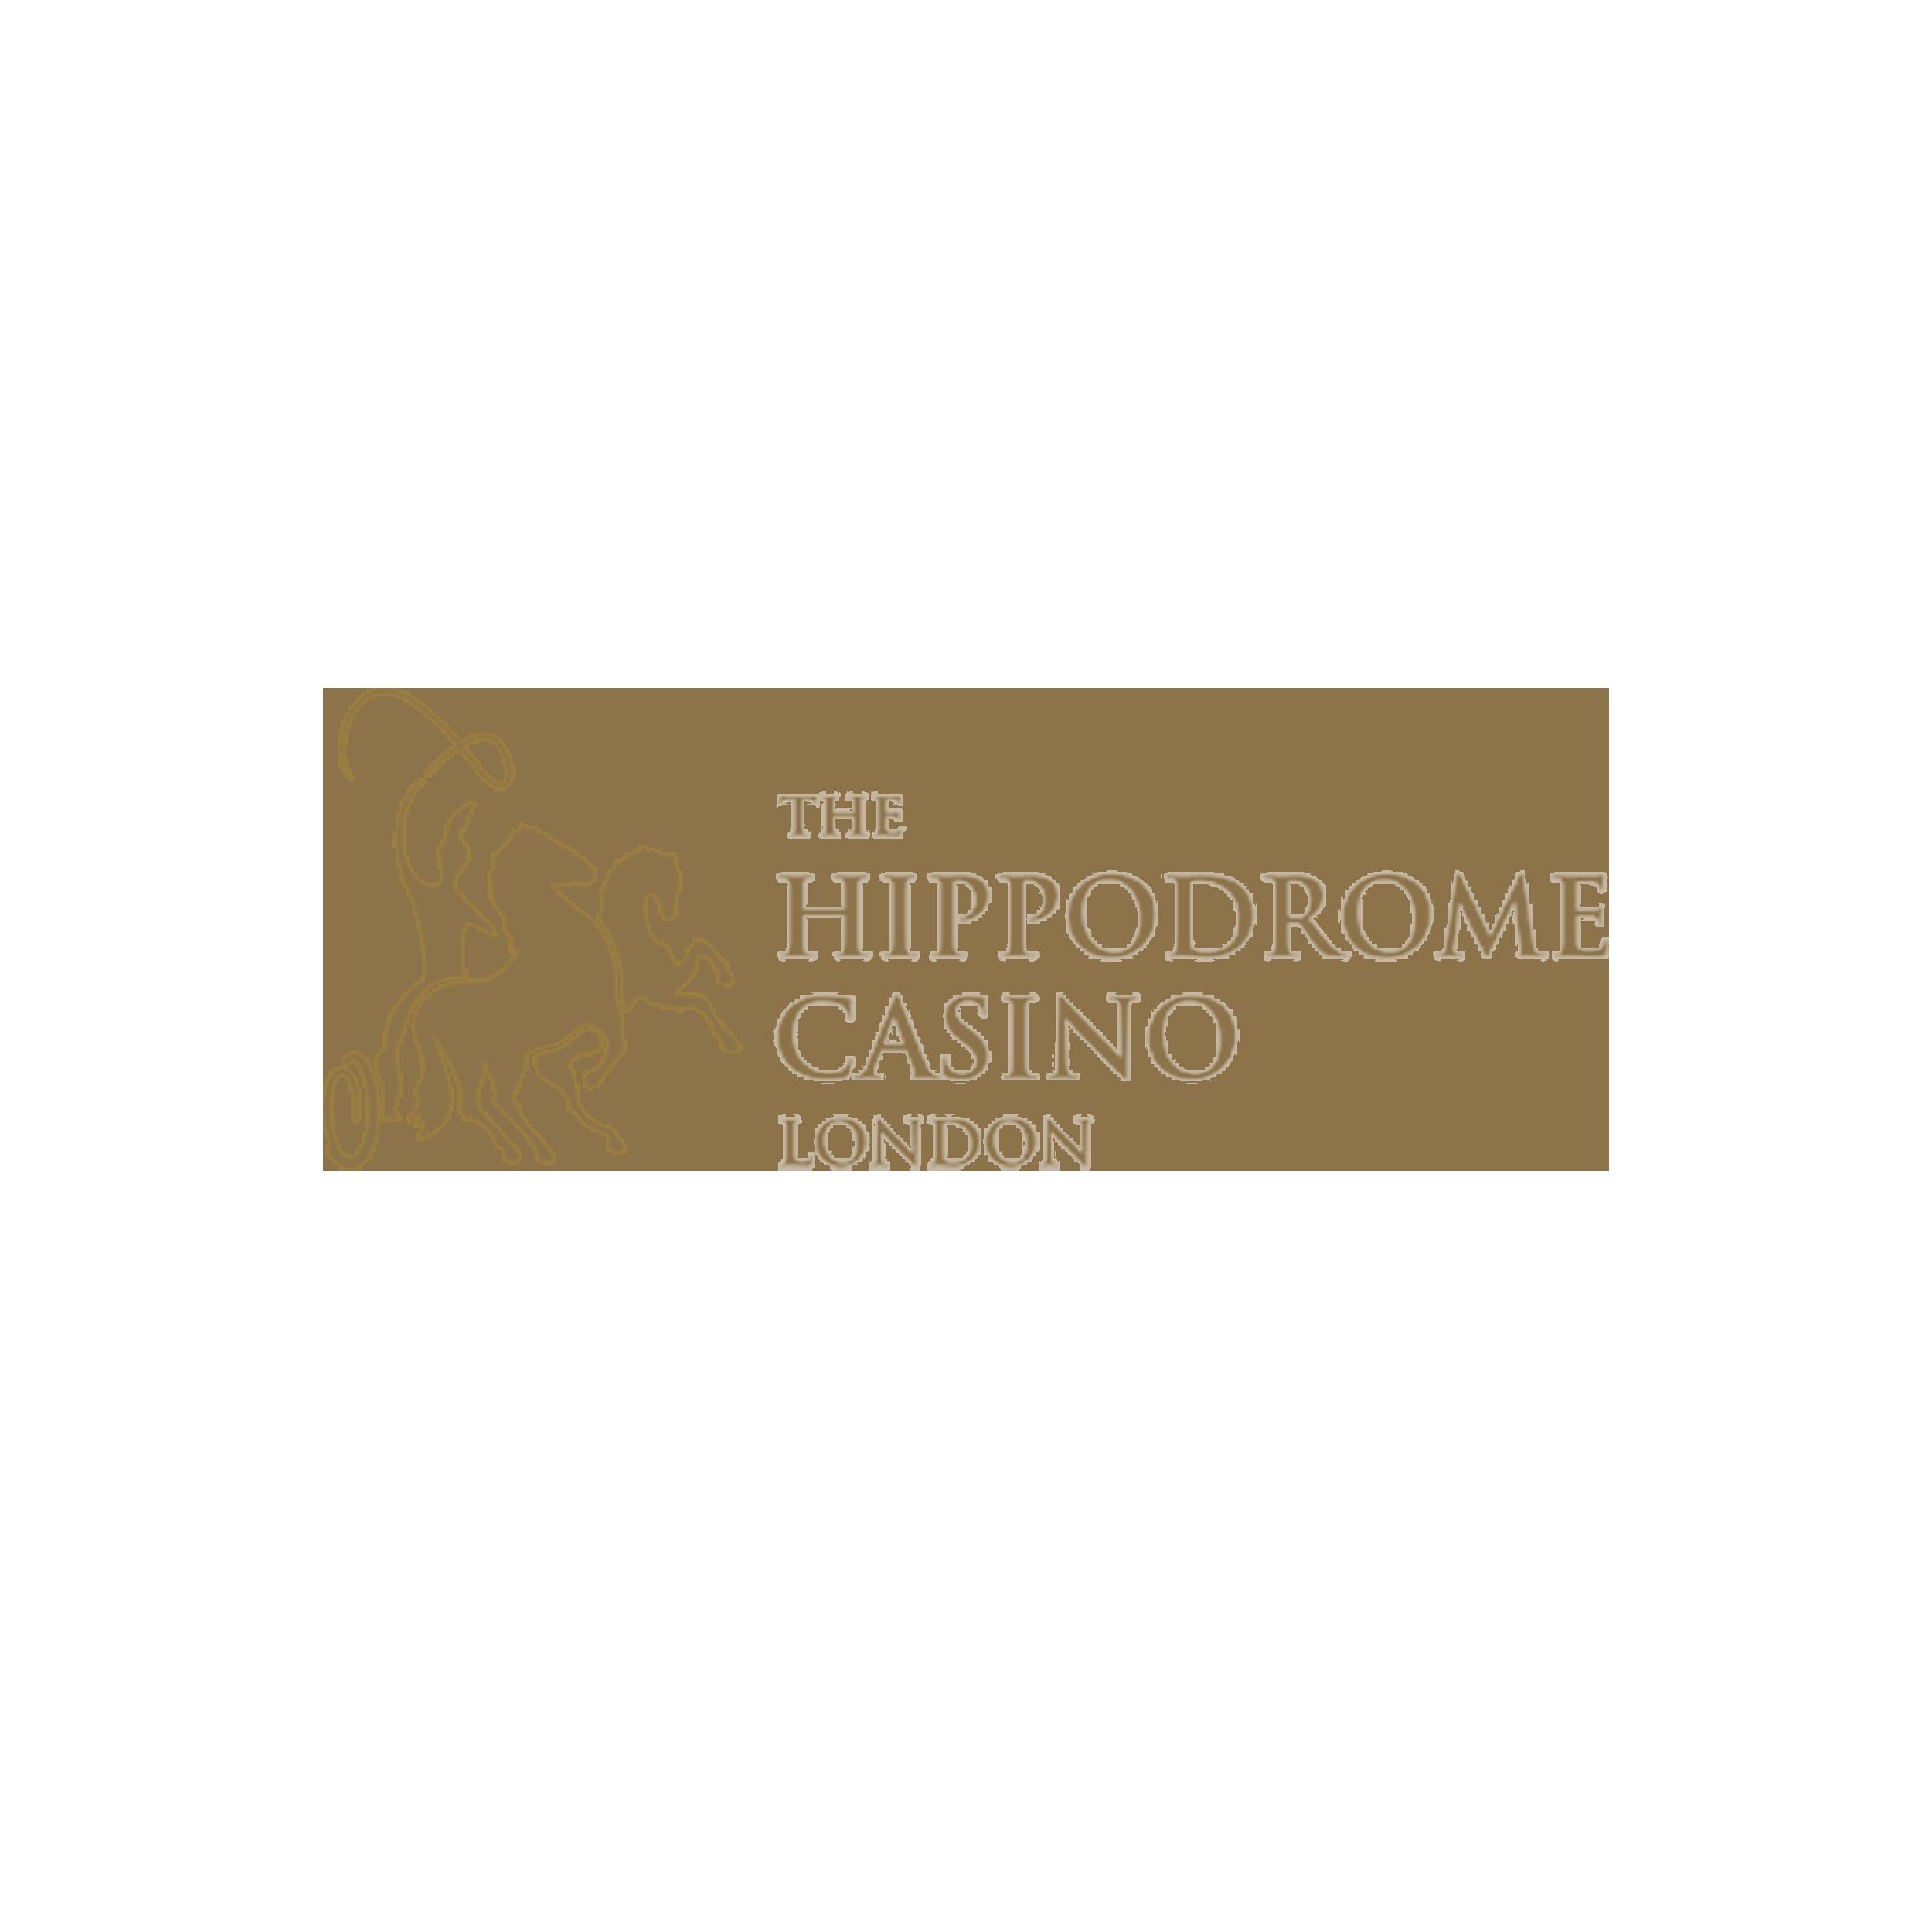 Hippodrome casino logo gold.png